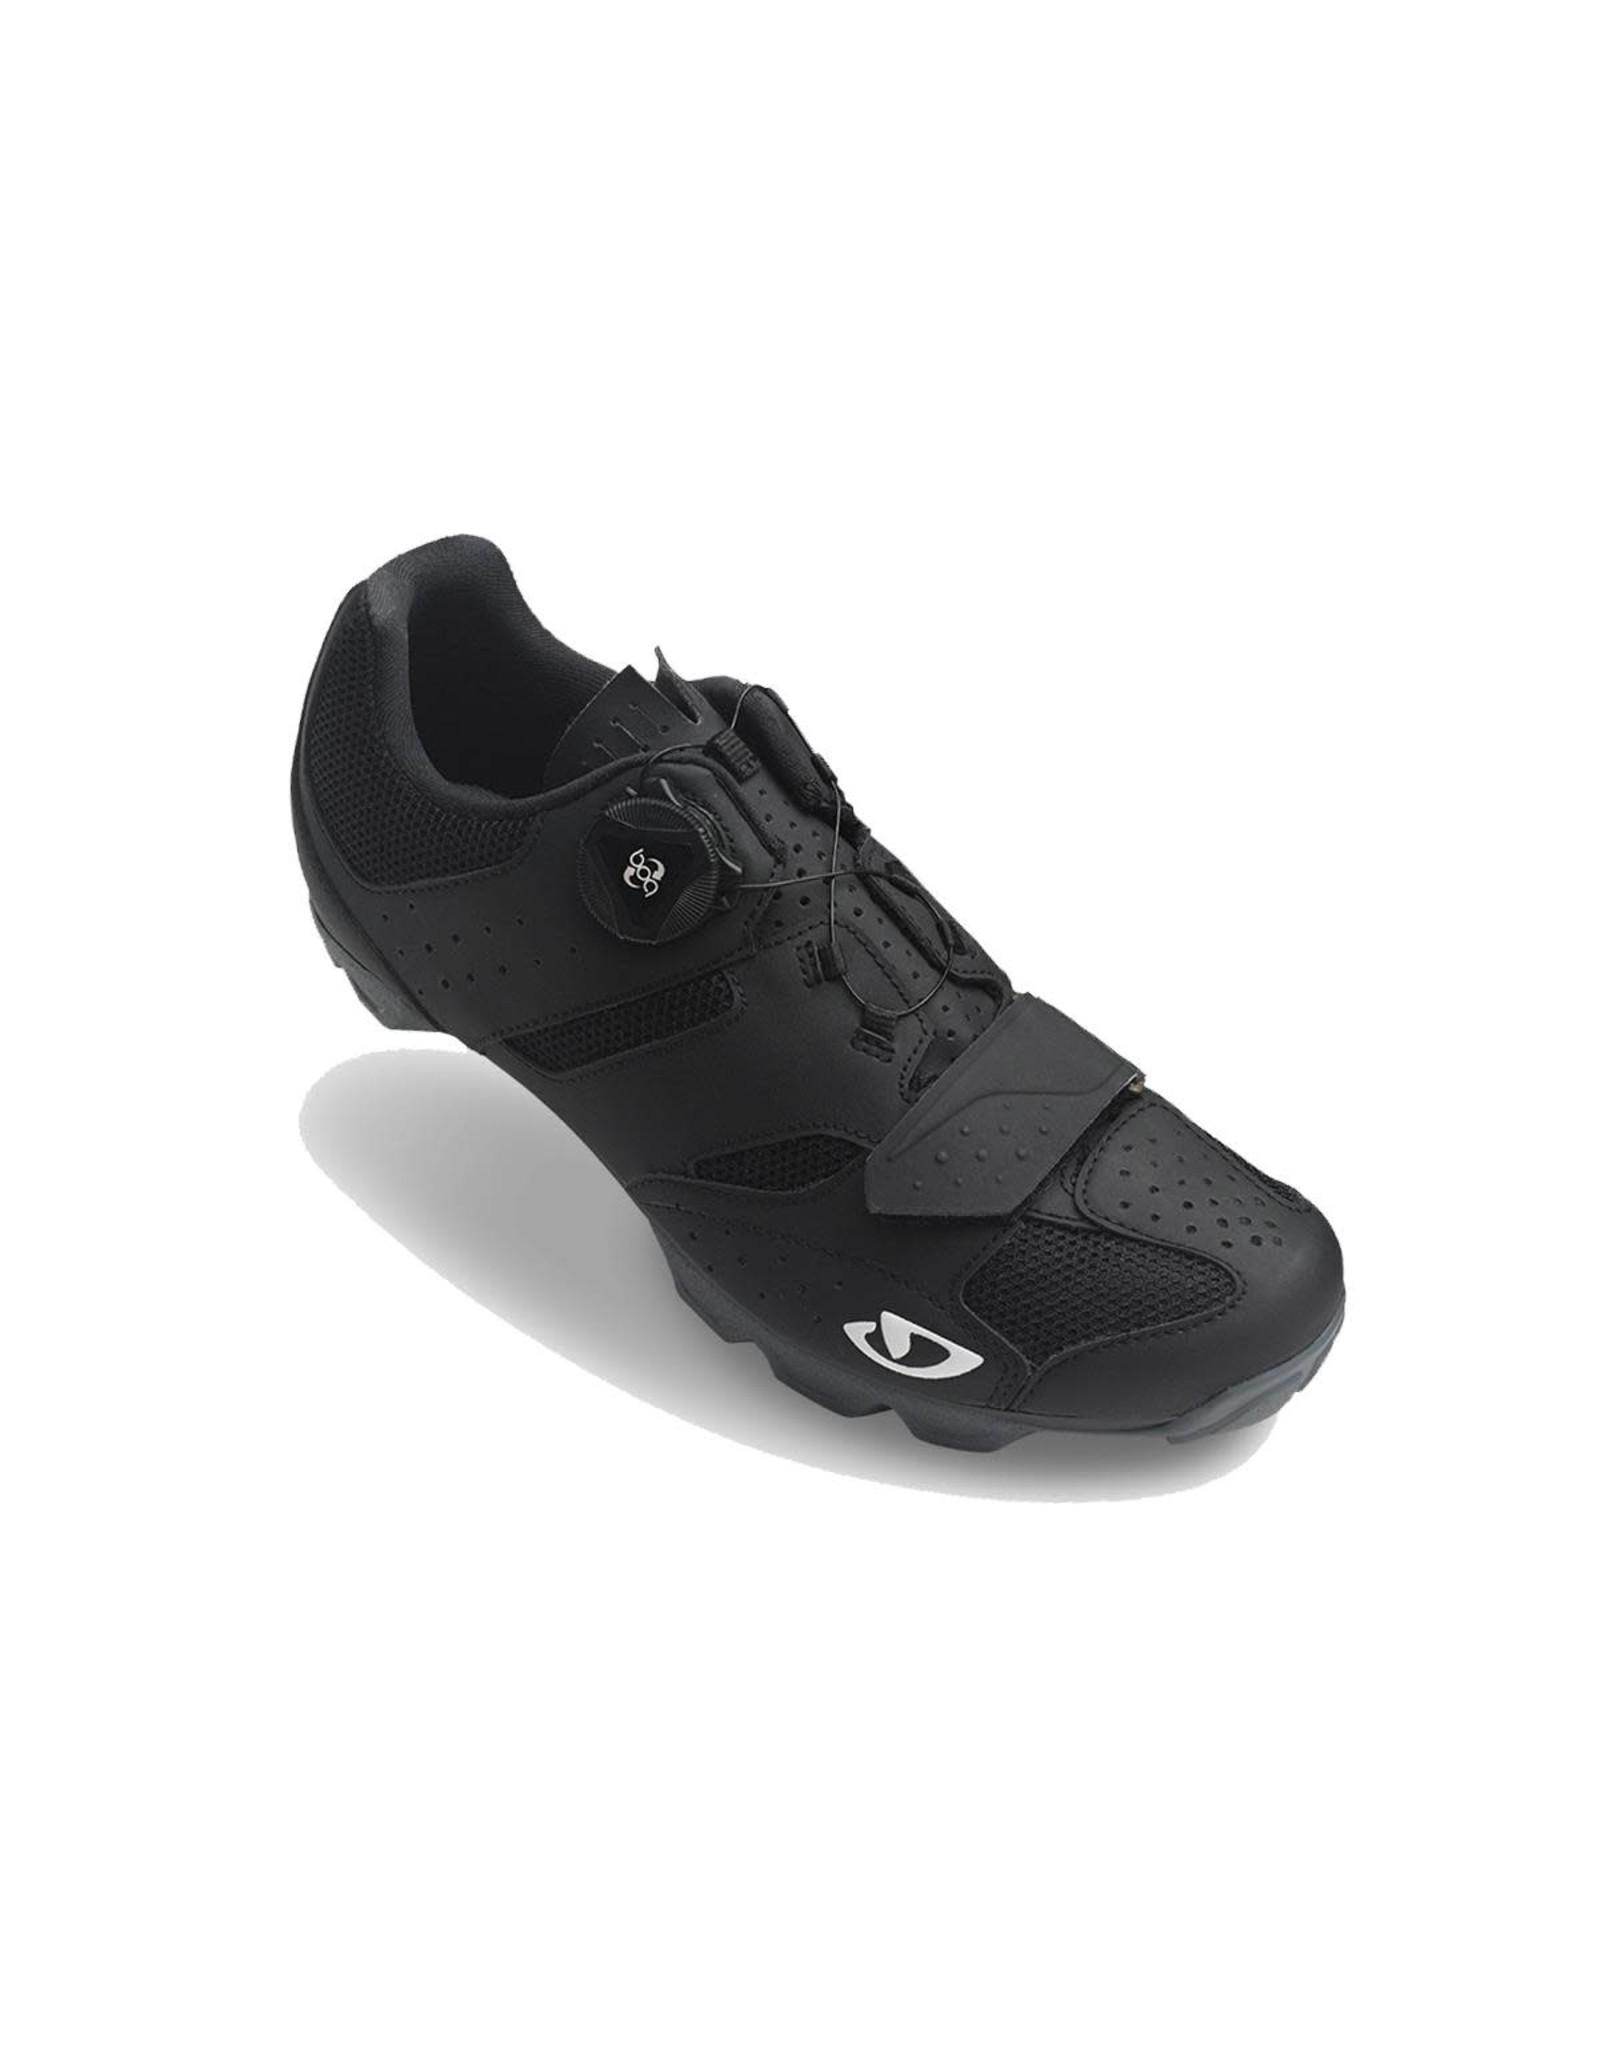 Giro GIRO CYLINDER MTB CYCLING SHOES 2019: BLACK 45